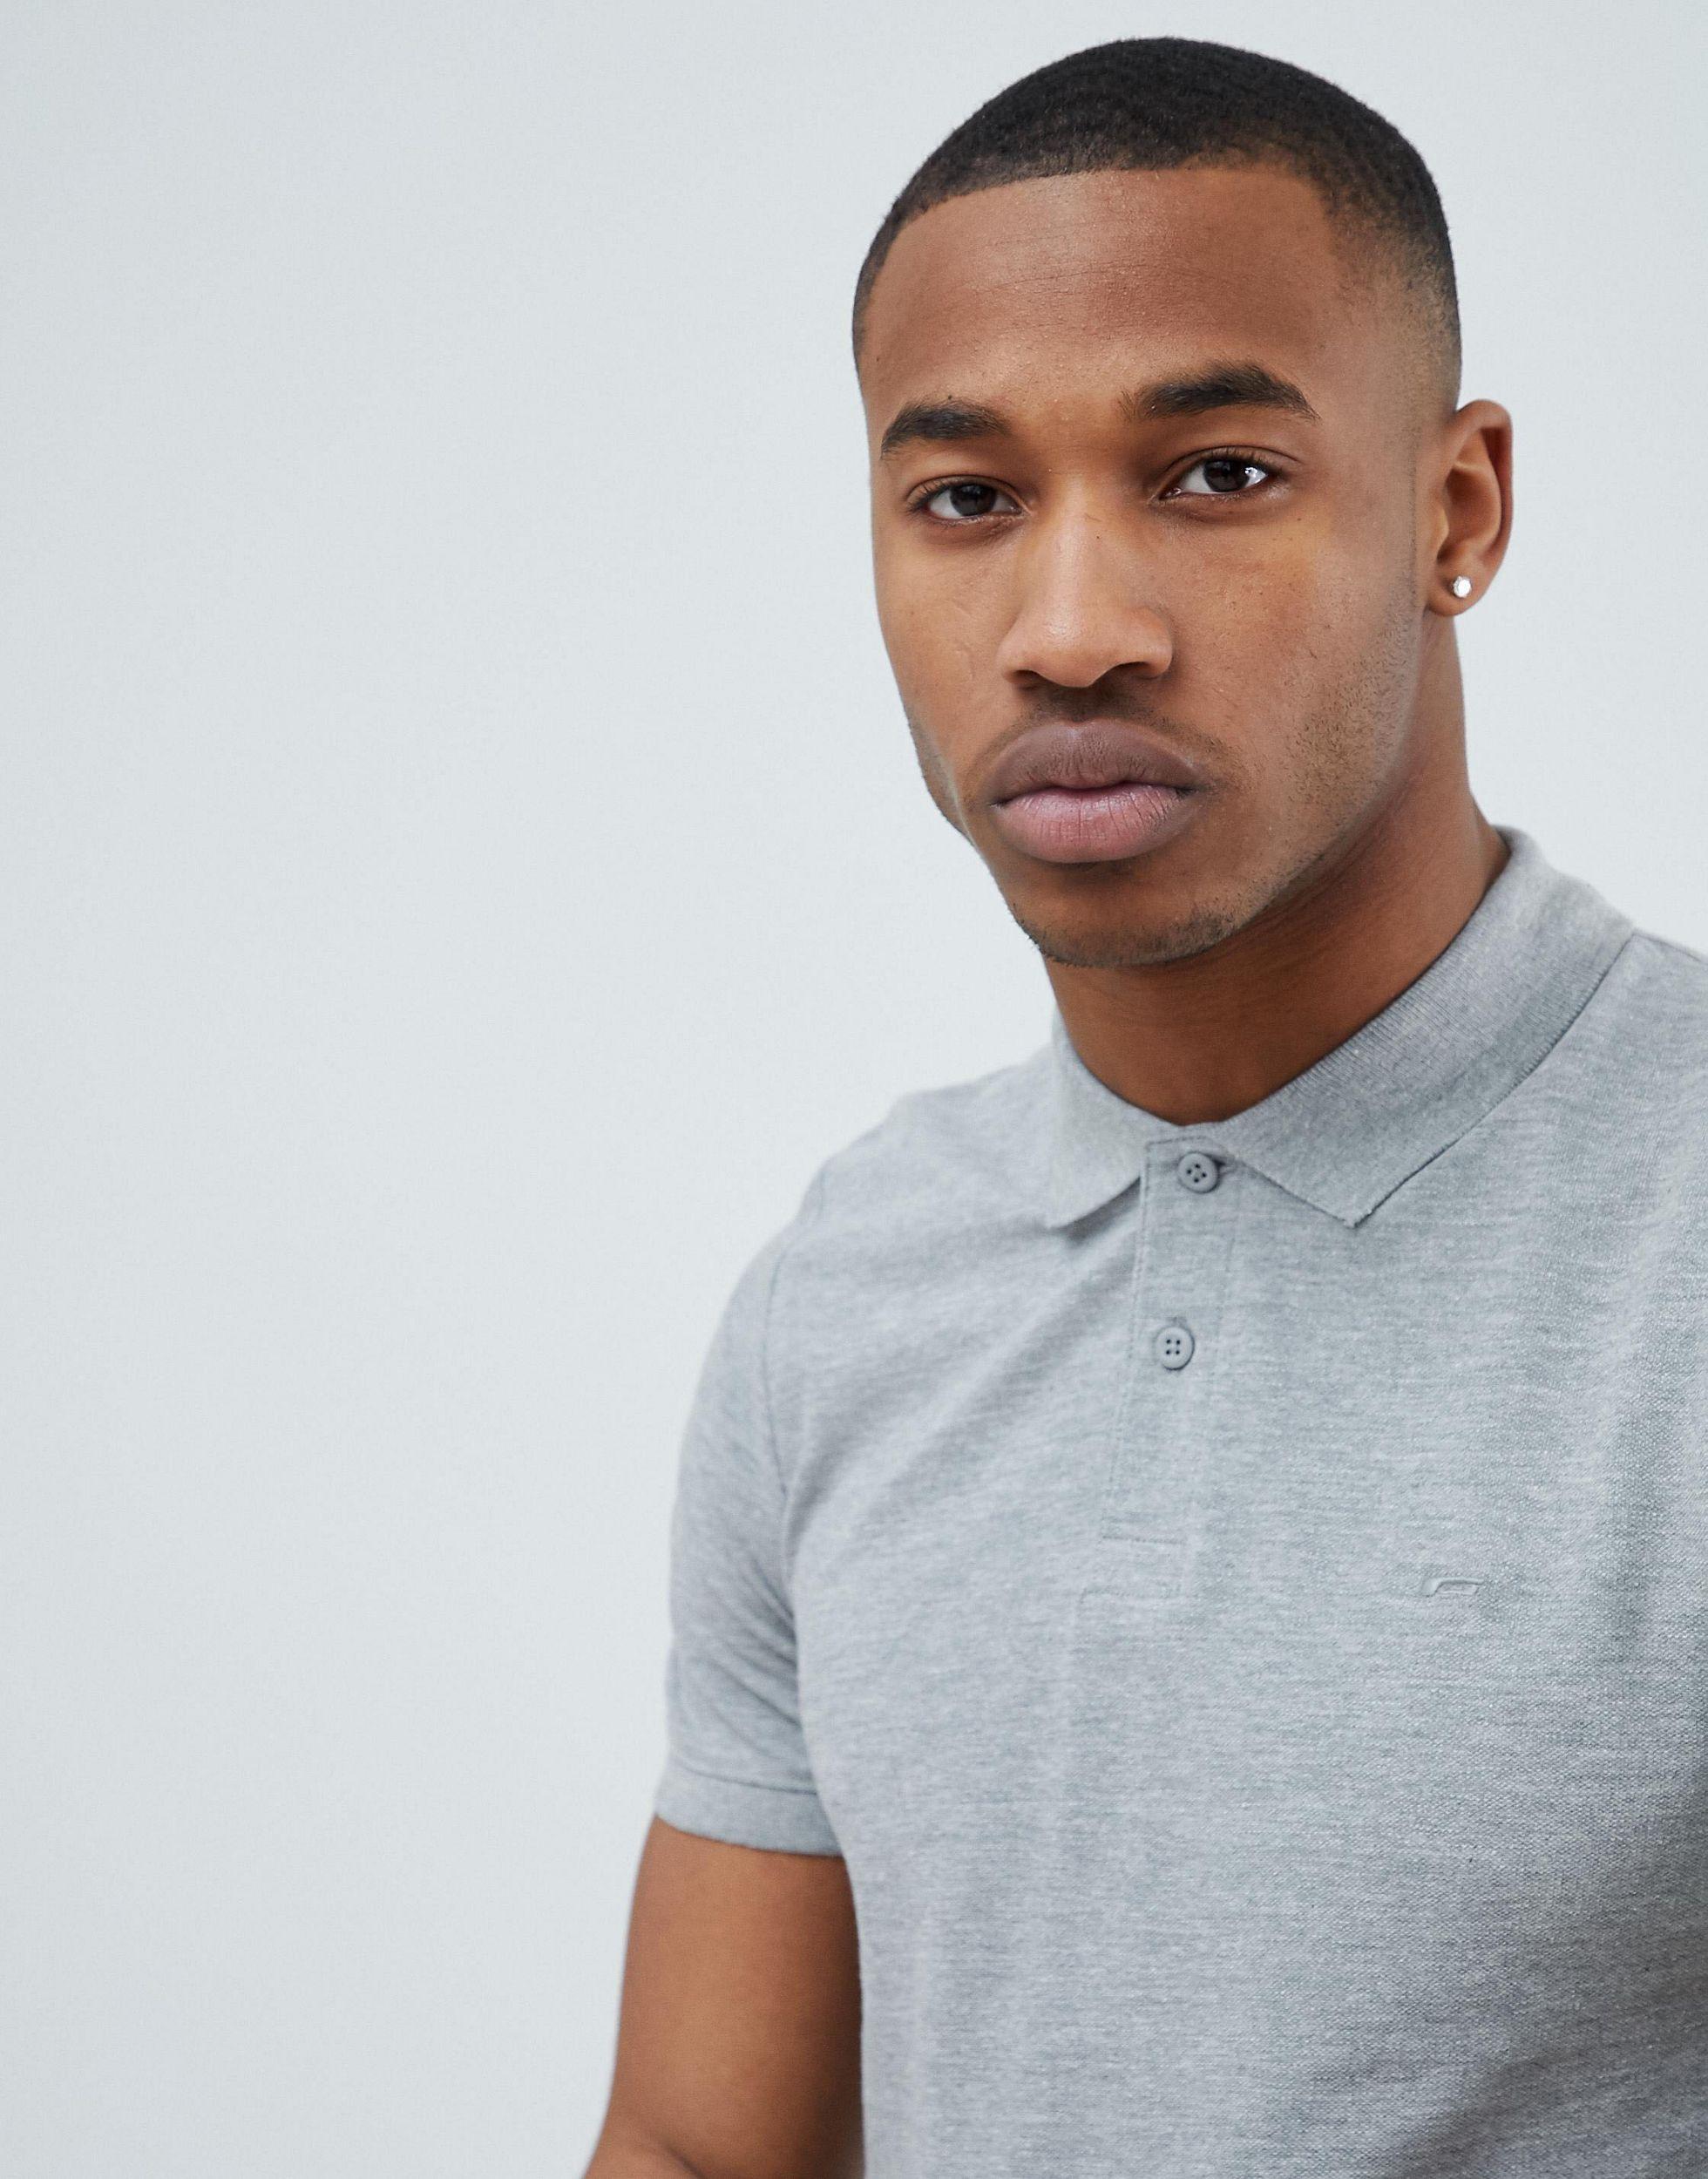 Jack & Jones Denim Essentials Slim Fit Pique Logo Polo in Grey (Grey) for Men